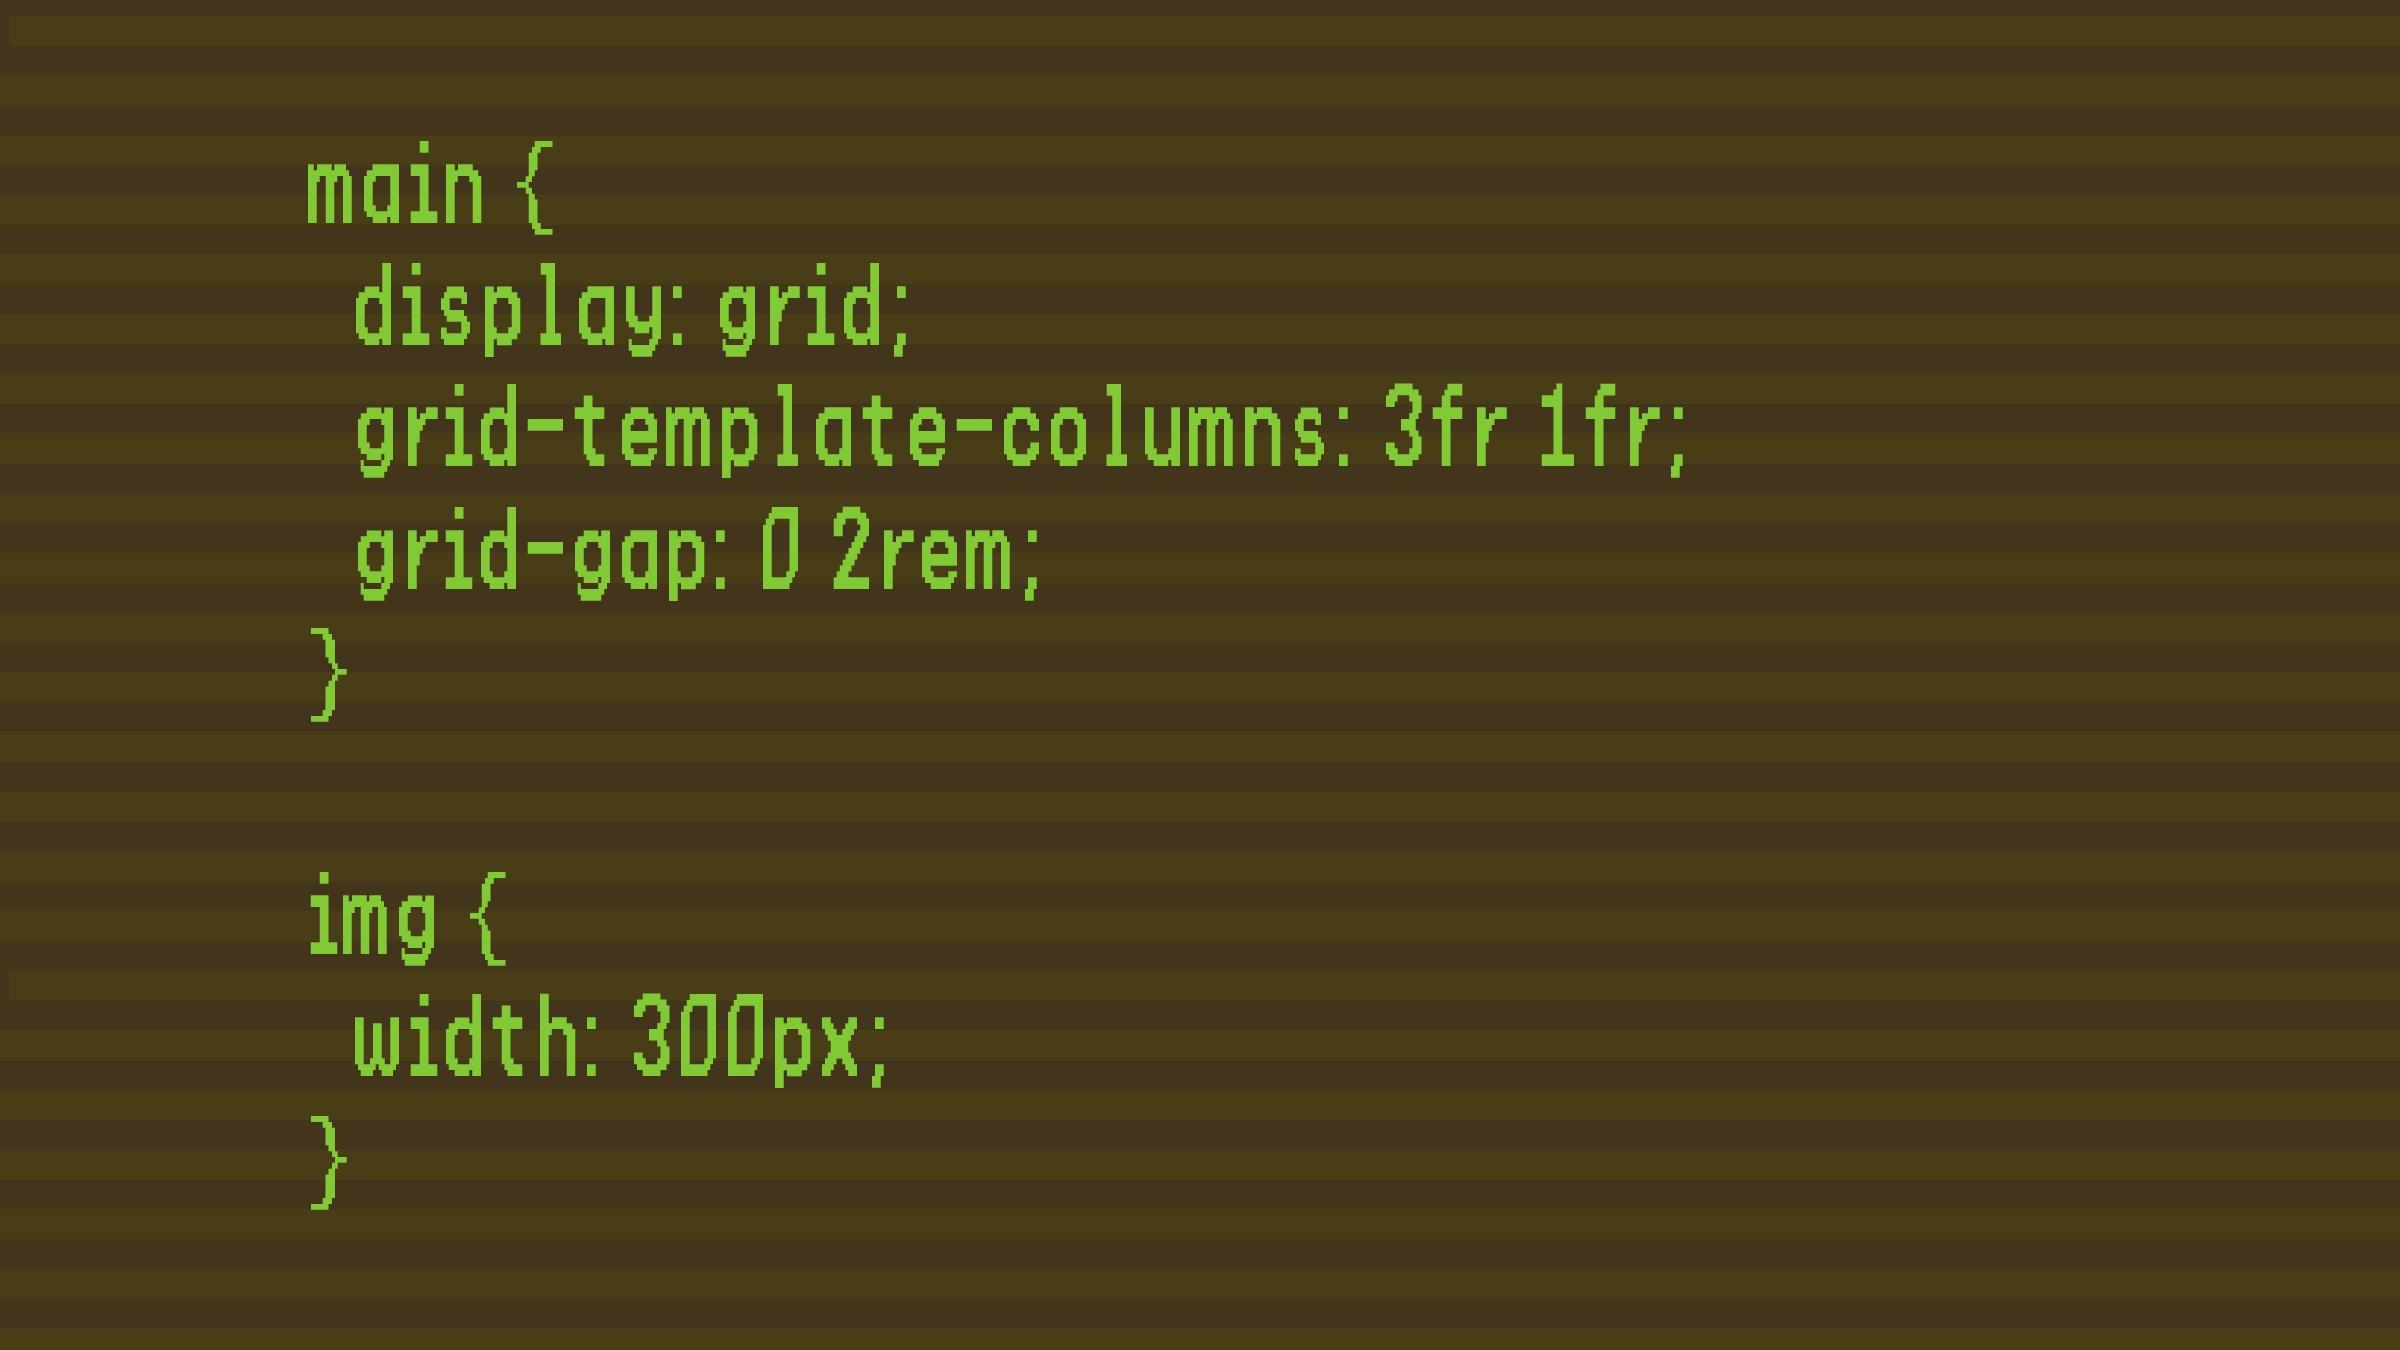 main { display: grid; grid-template-columns: 3f...